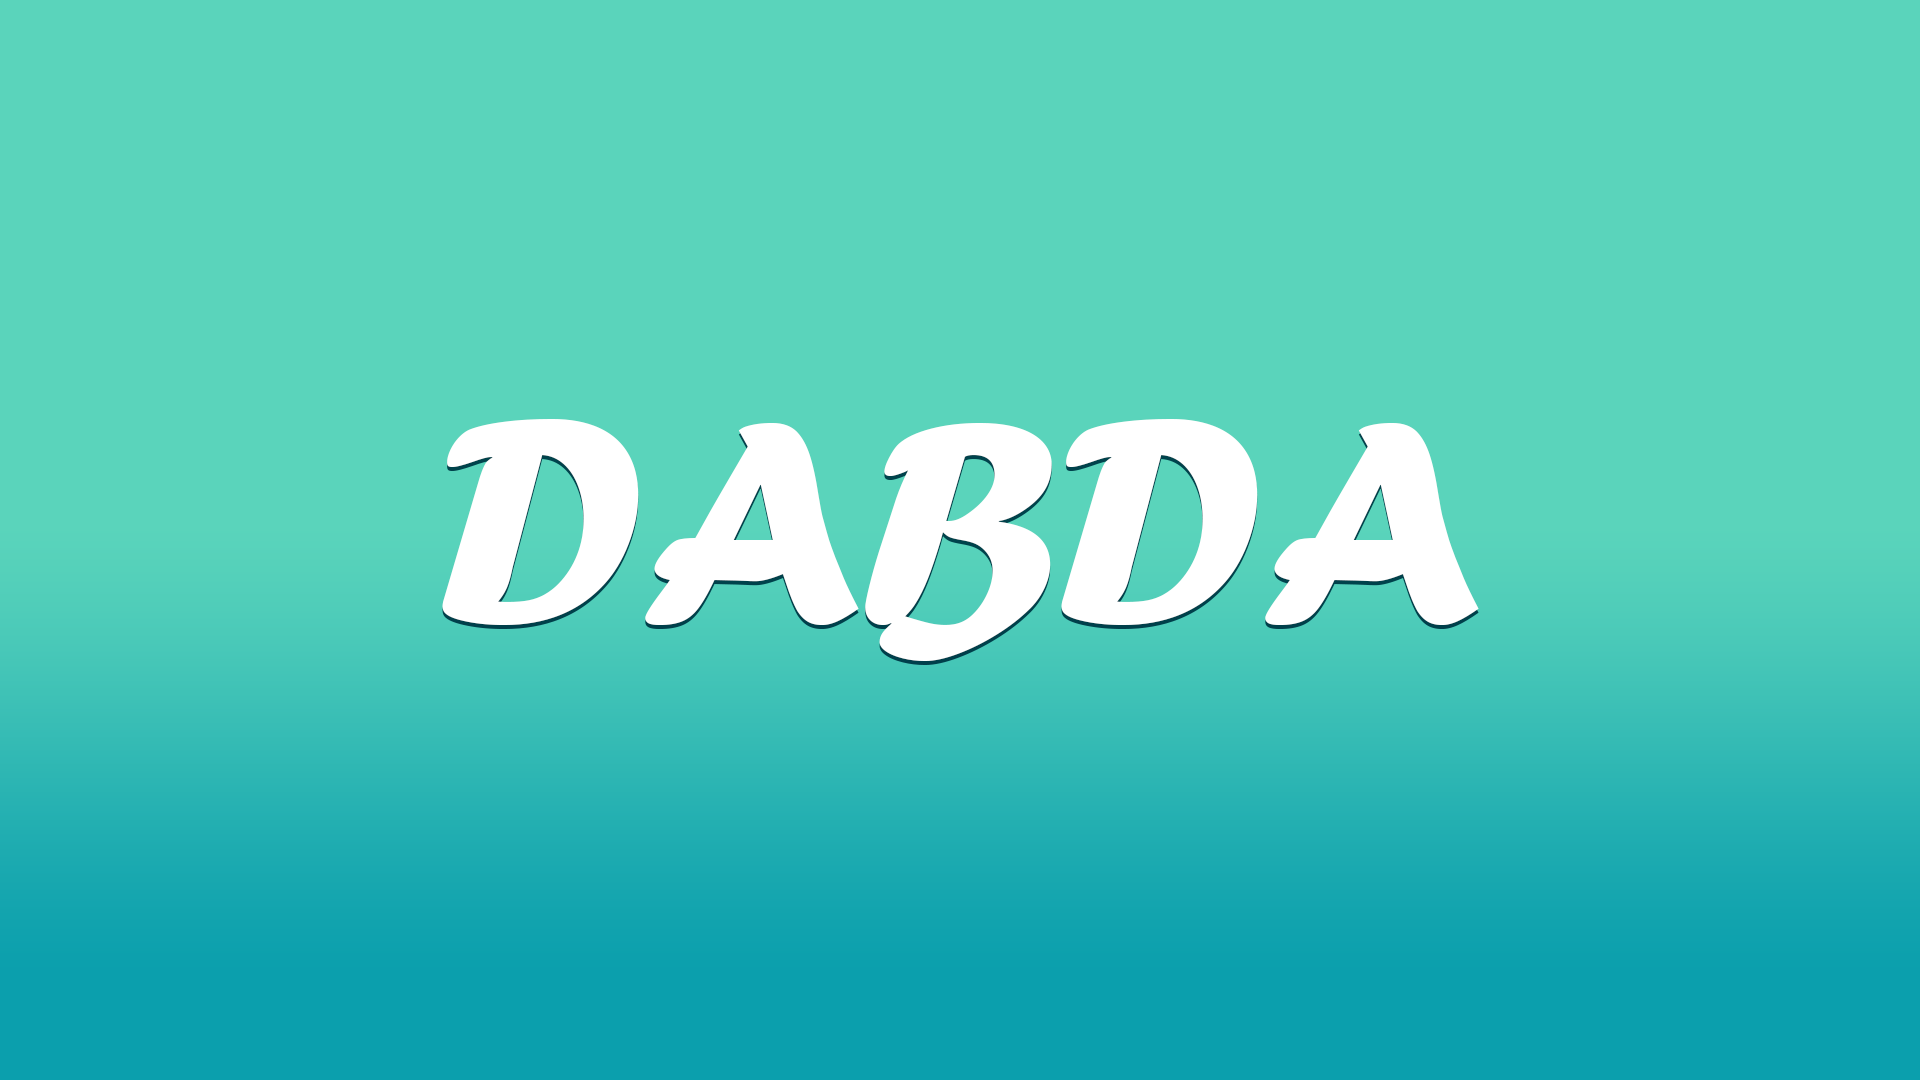 DABDA